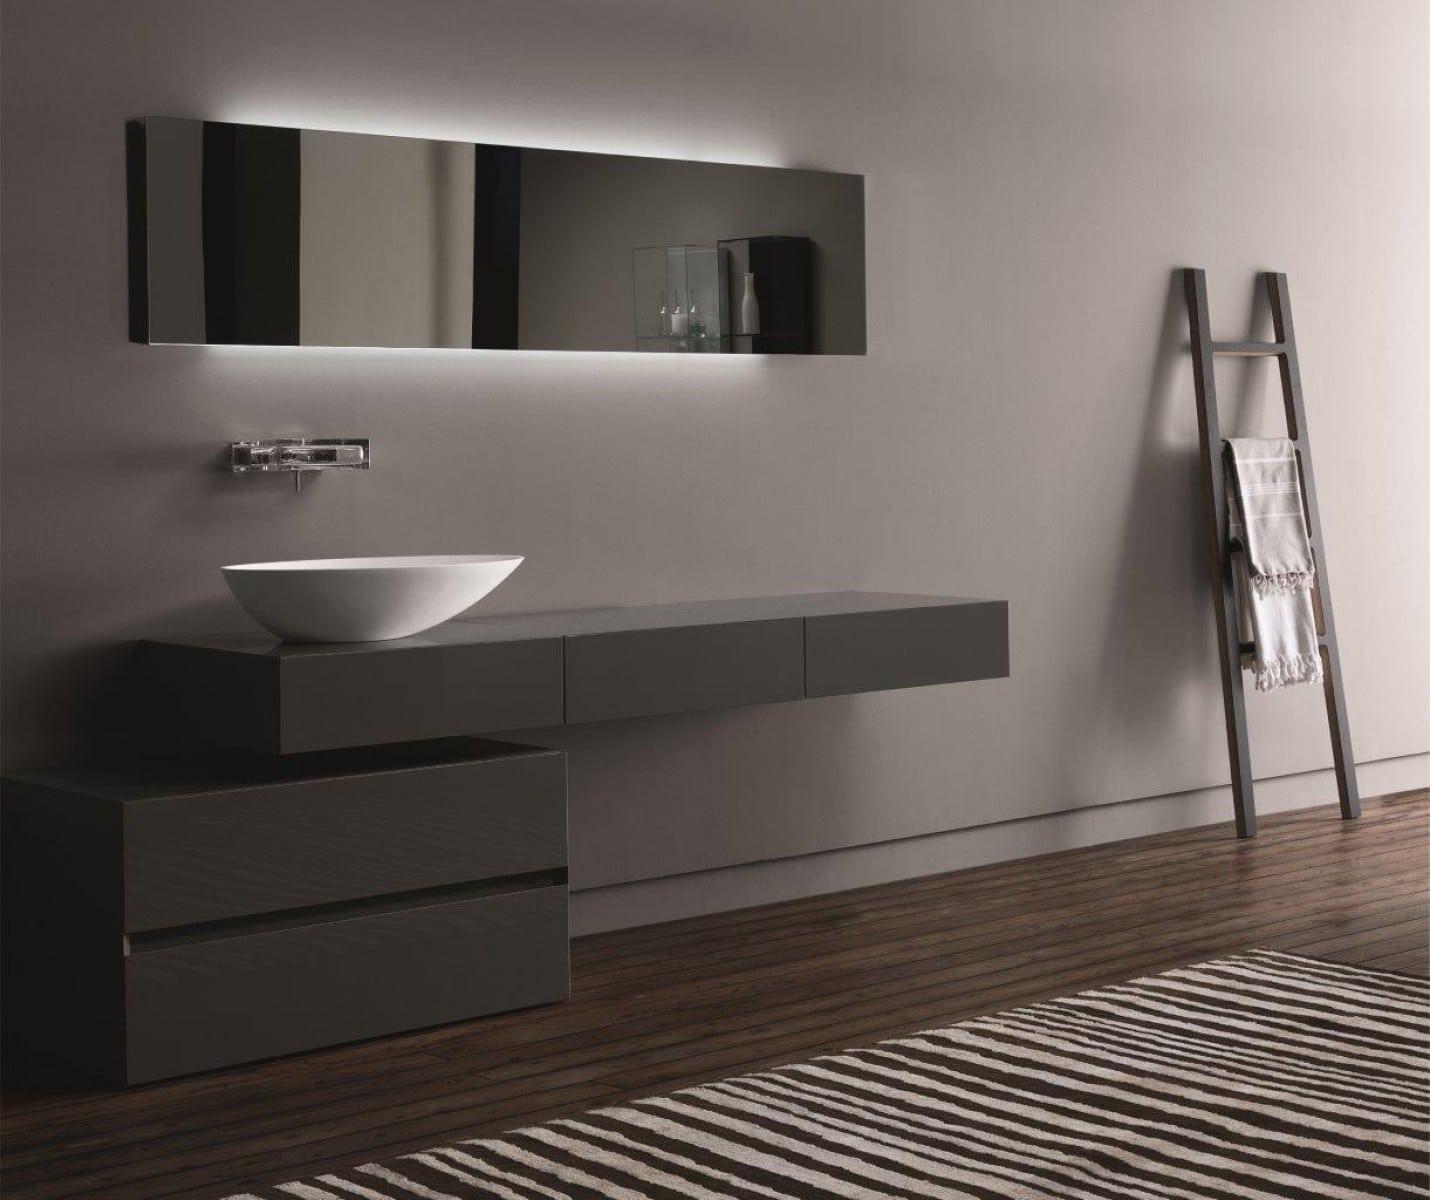 Cuarto De Baño Moderno Fotos:de cuartos de baño ultra modernos, actualiza la decoración de